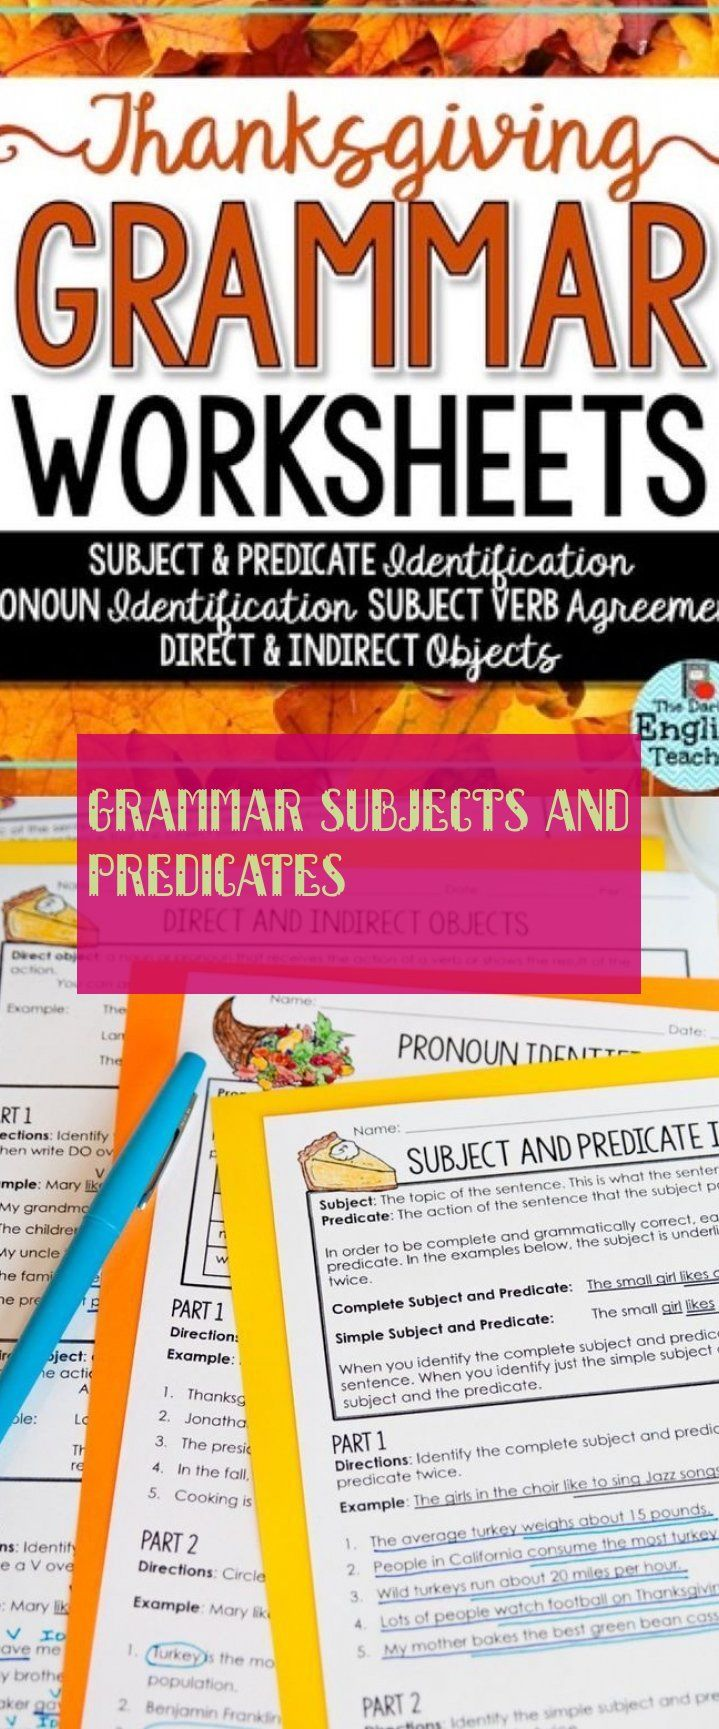 Grammatikfacher Und Pradikate Education Teaching Grammar Subject And Predicate Grammar Worksheets [ 1729 x 719 Pixel ]